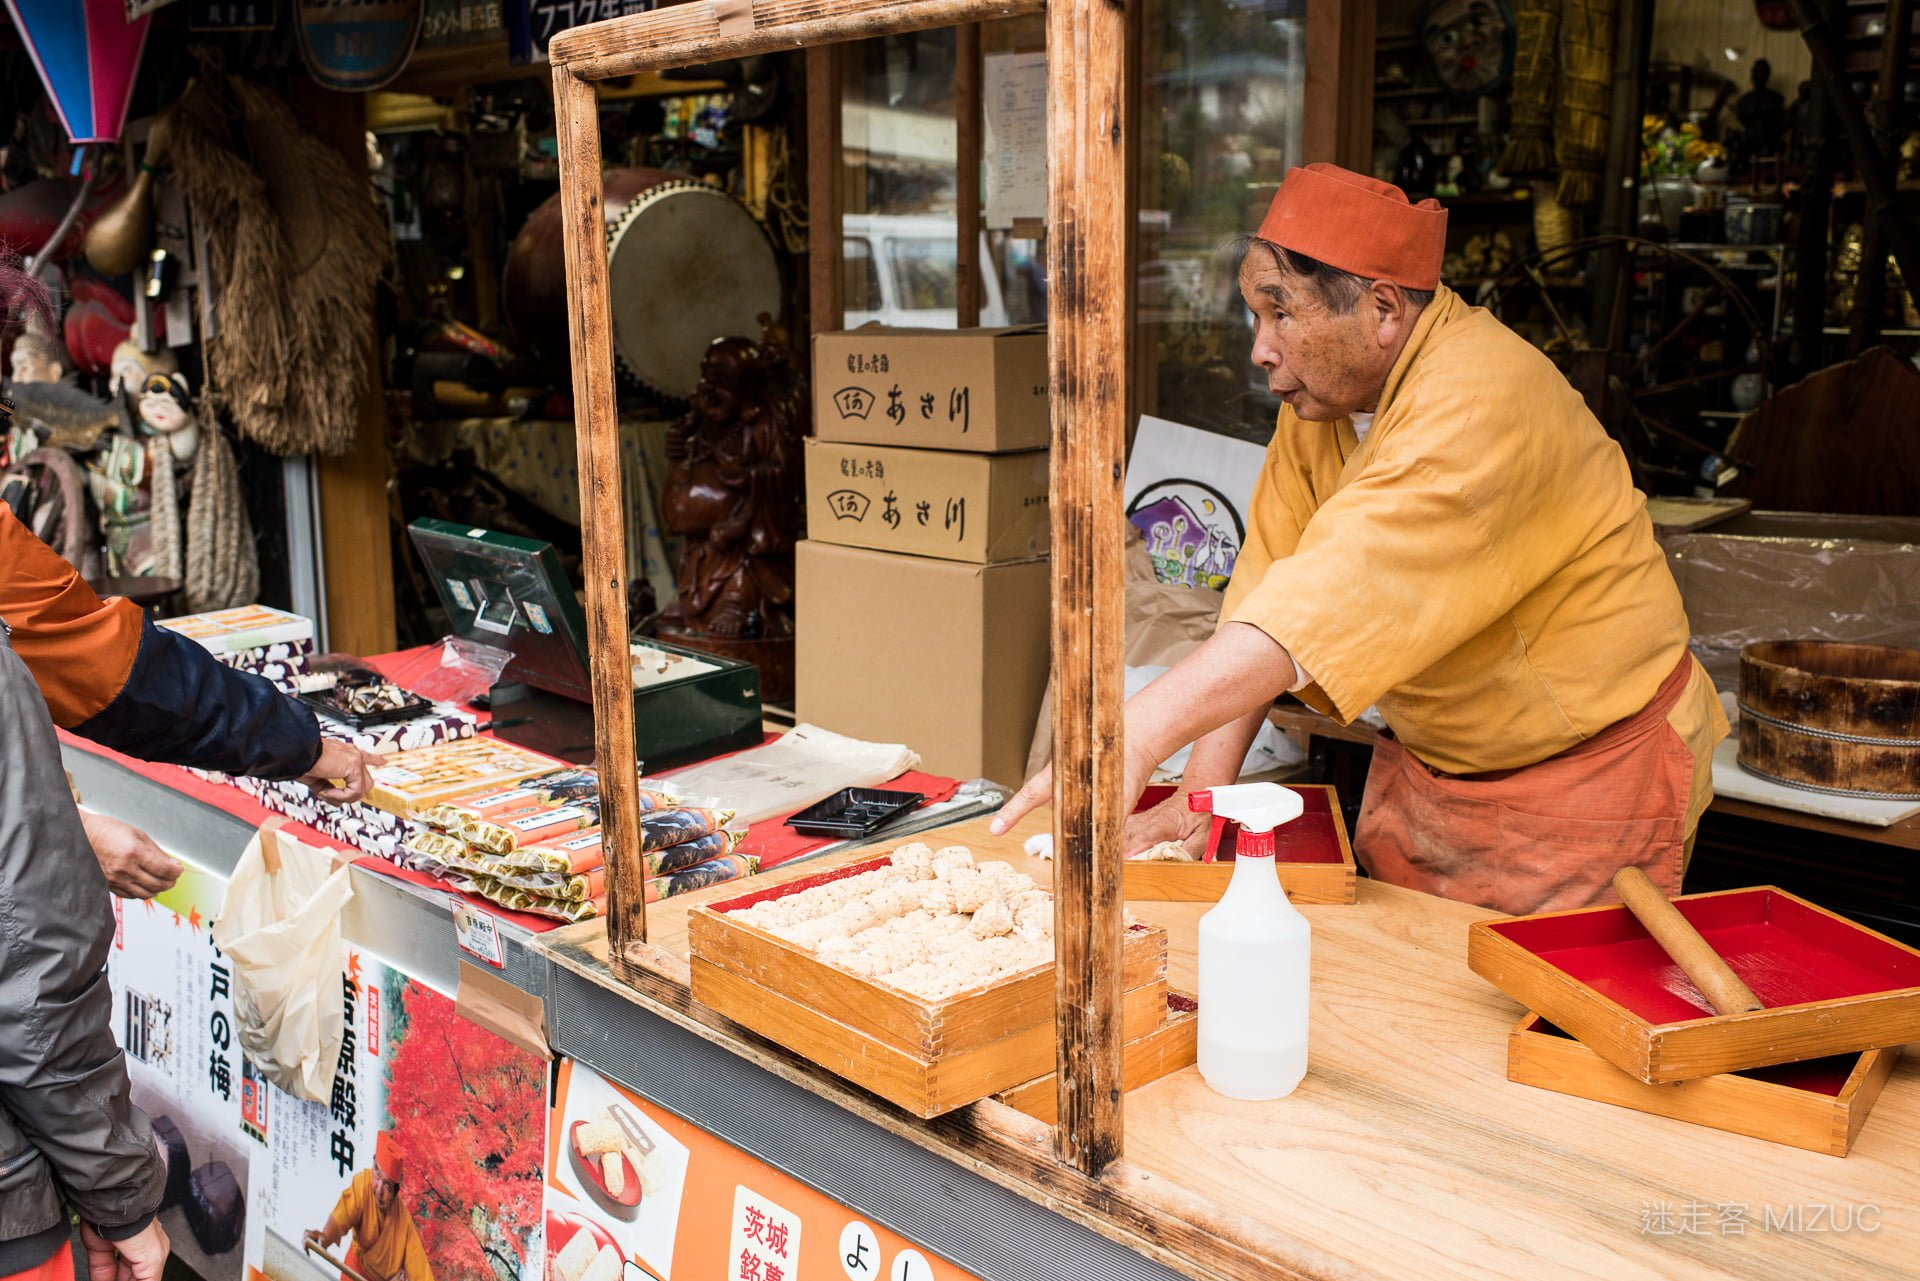 201711 Ibaraki Tochigi Gunma Japan Travel By RentalCar 41 日本自駕旅遊/北關東三縣「茨城、櫪木、群馬」秋天美食、溫泉與瀑布秘境百景(精選照片分享)